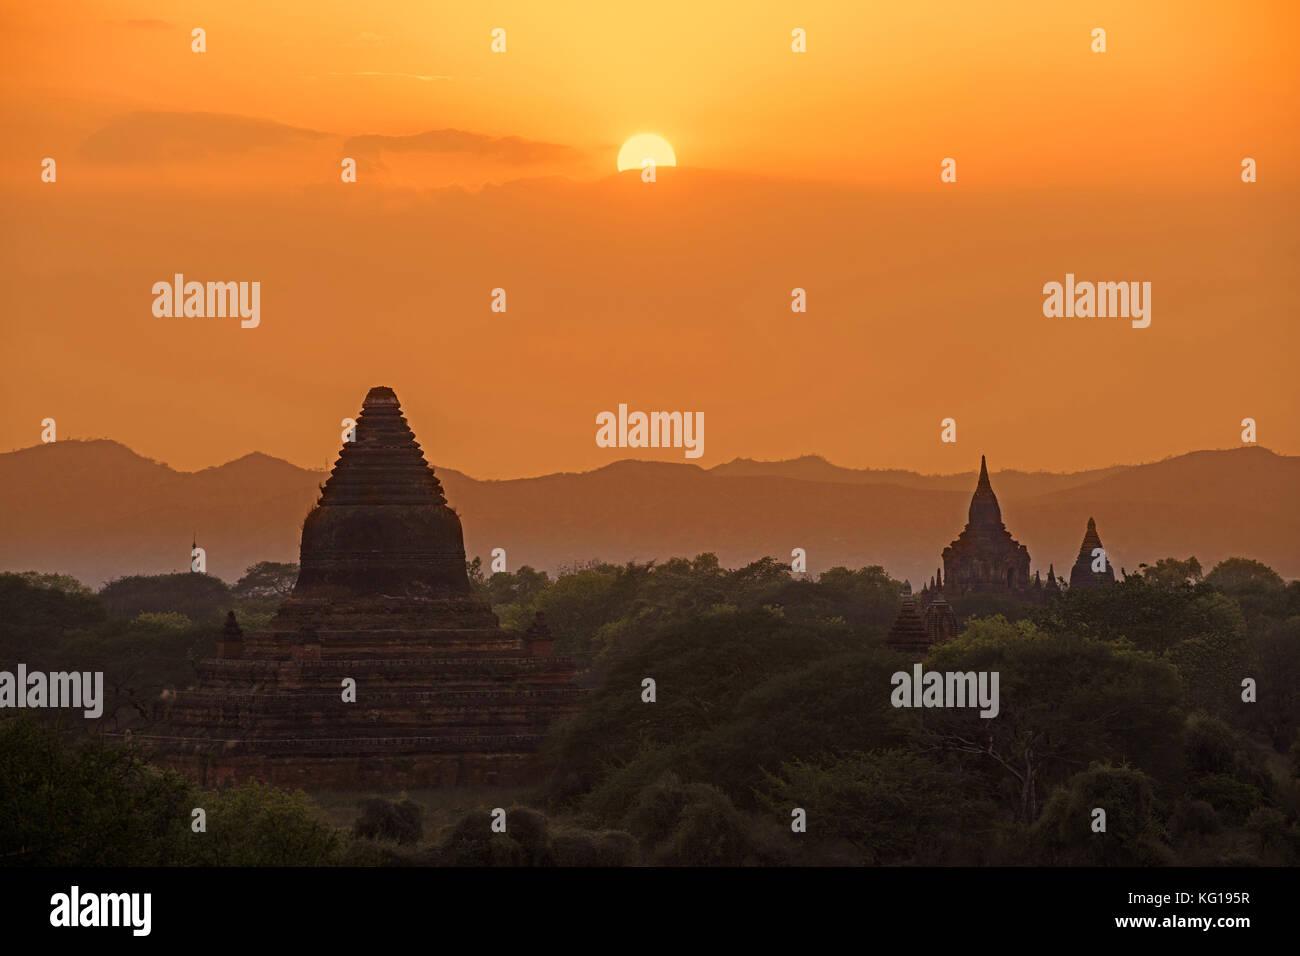 Buddhist temples and pagodas at sunset in the ancient city Bagan / Pagan, Mandalay Region, Myanmar / Burma - Stock Image